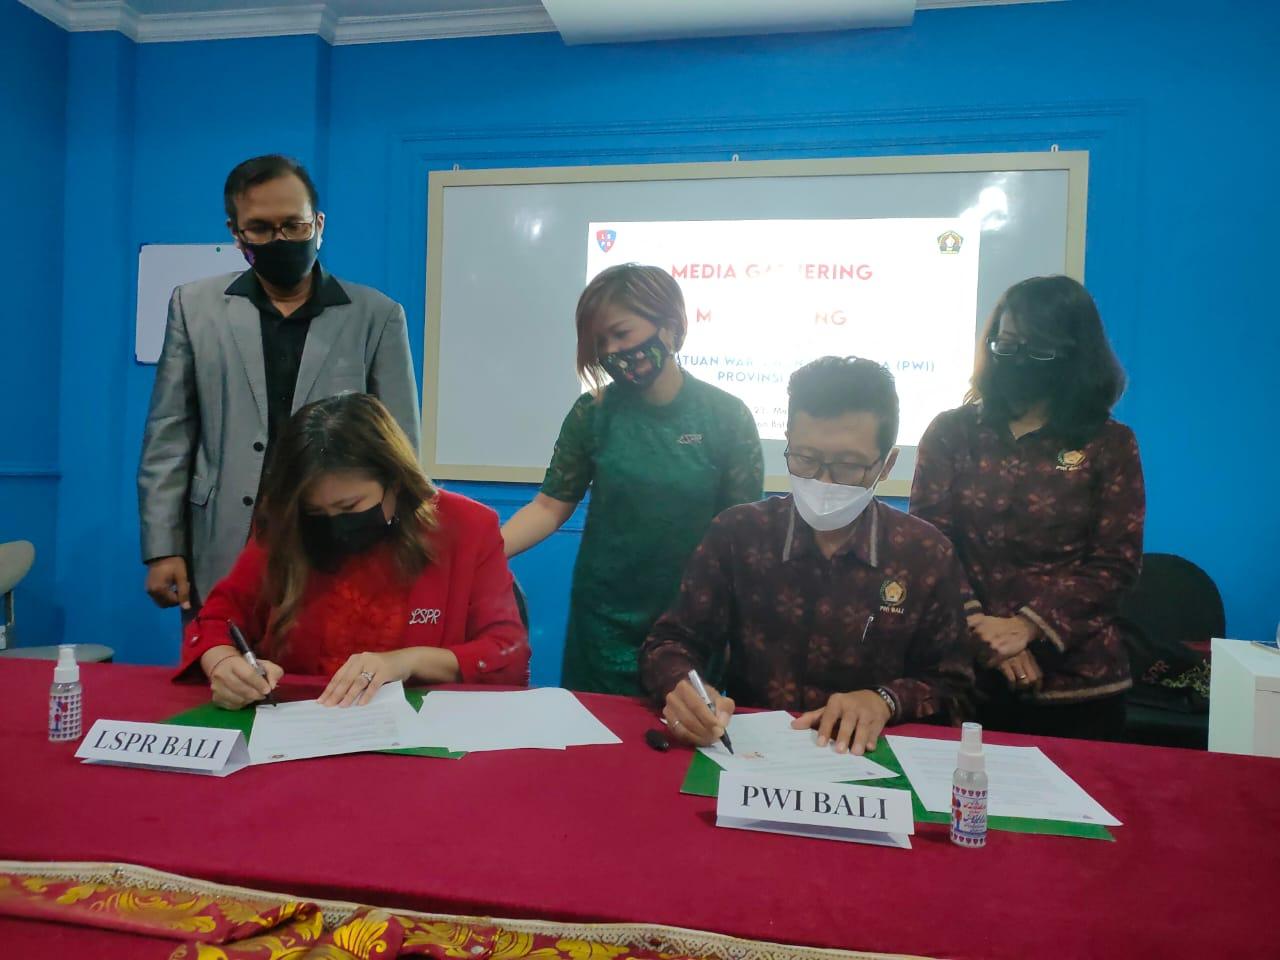 Representatif LSPR Bali Gesille Sedra Buot-Zambrano, MBA (kiri) dan Ketua PWI Provinsi Bali, IGMB Dwikora Putra menandatangani Nota Kesepahaman pemberdayaan Sumber Daya Manusia antara LSPR Bali dan PWI Bali